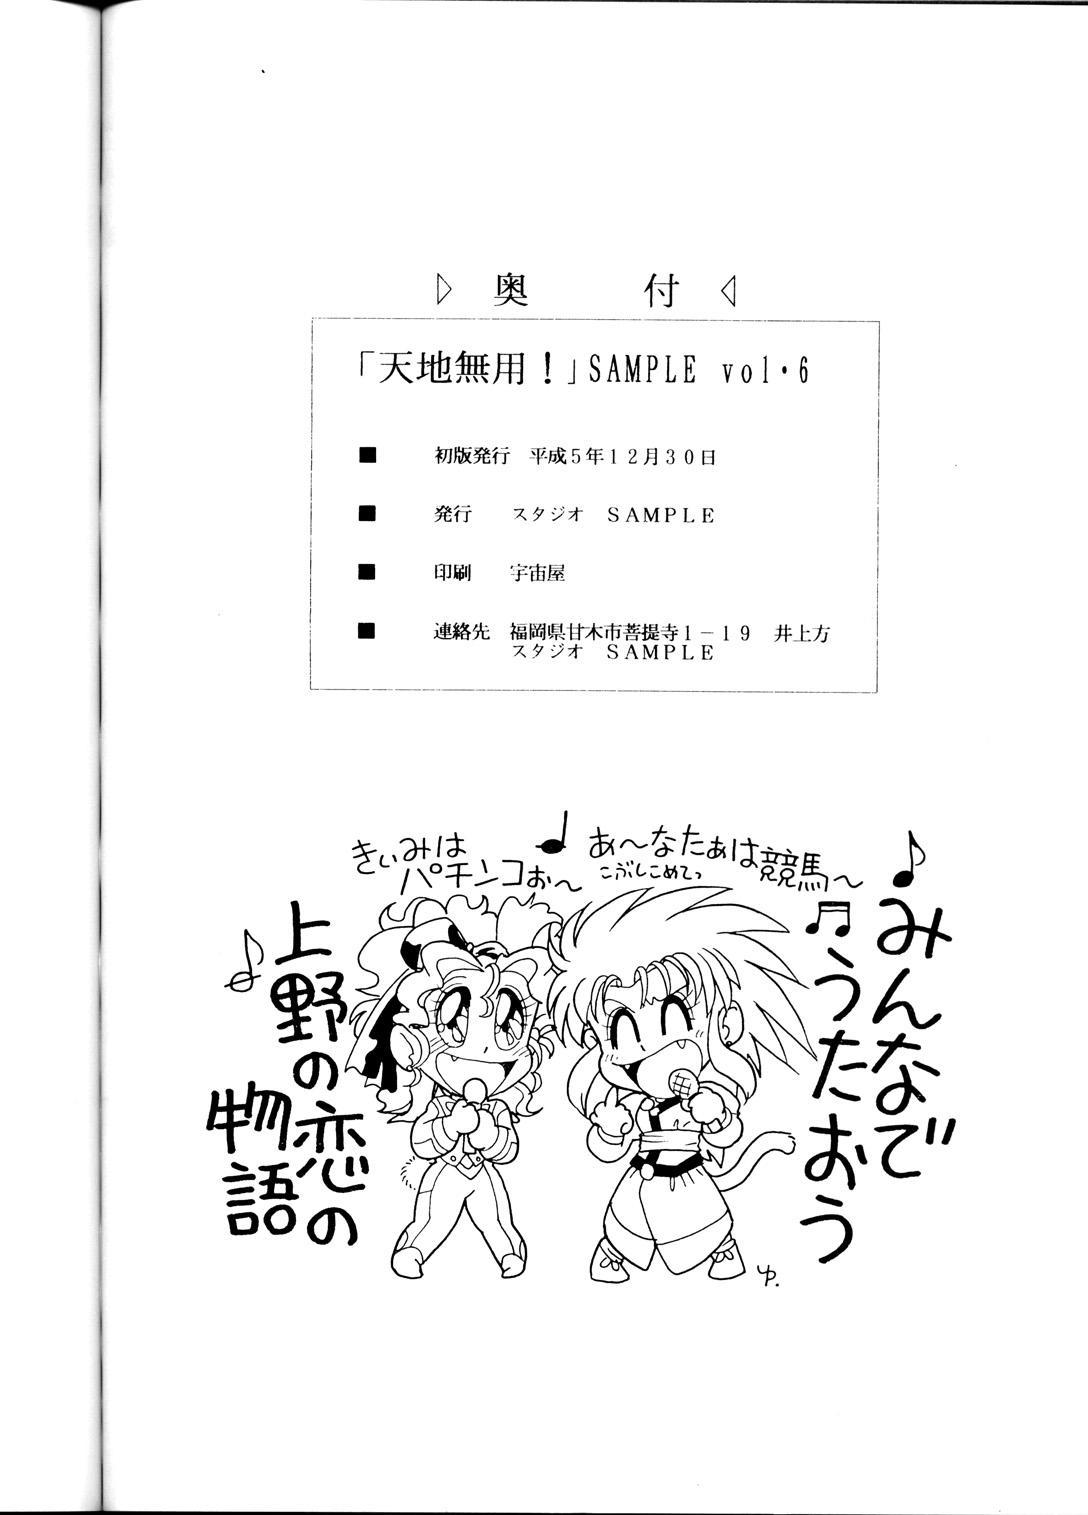 Tenchi Muyou! Sample Vol 6 48